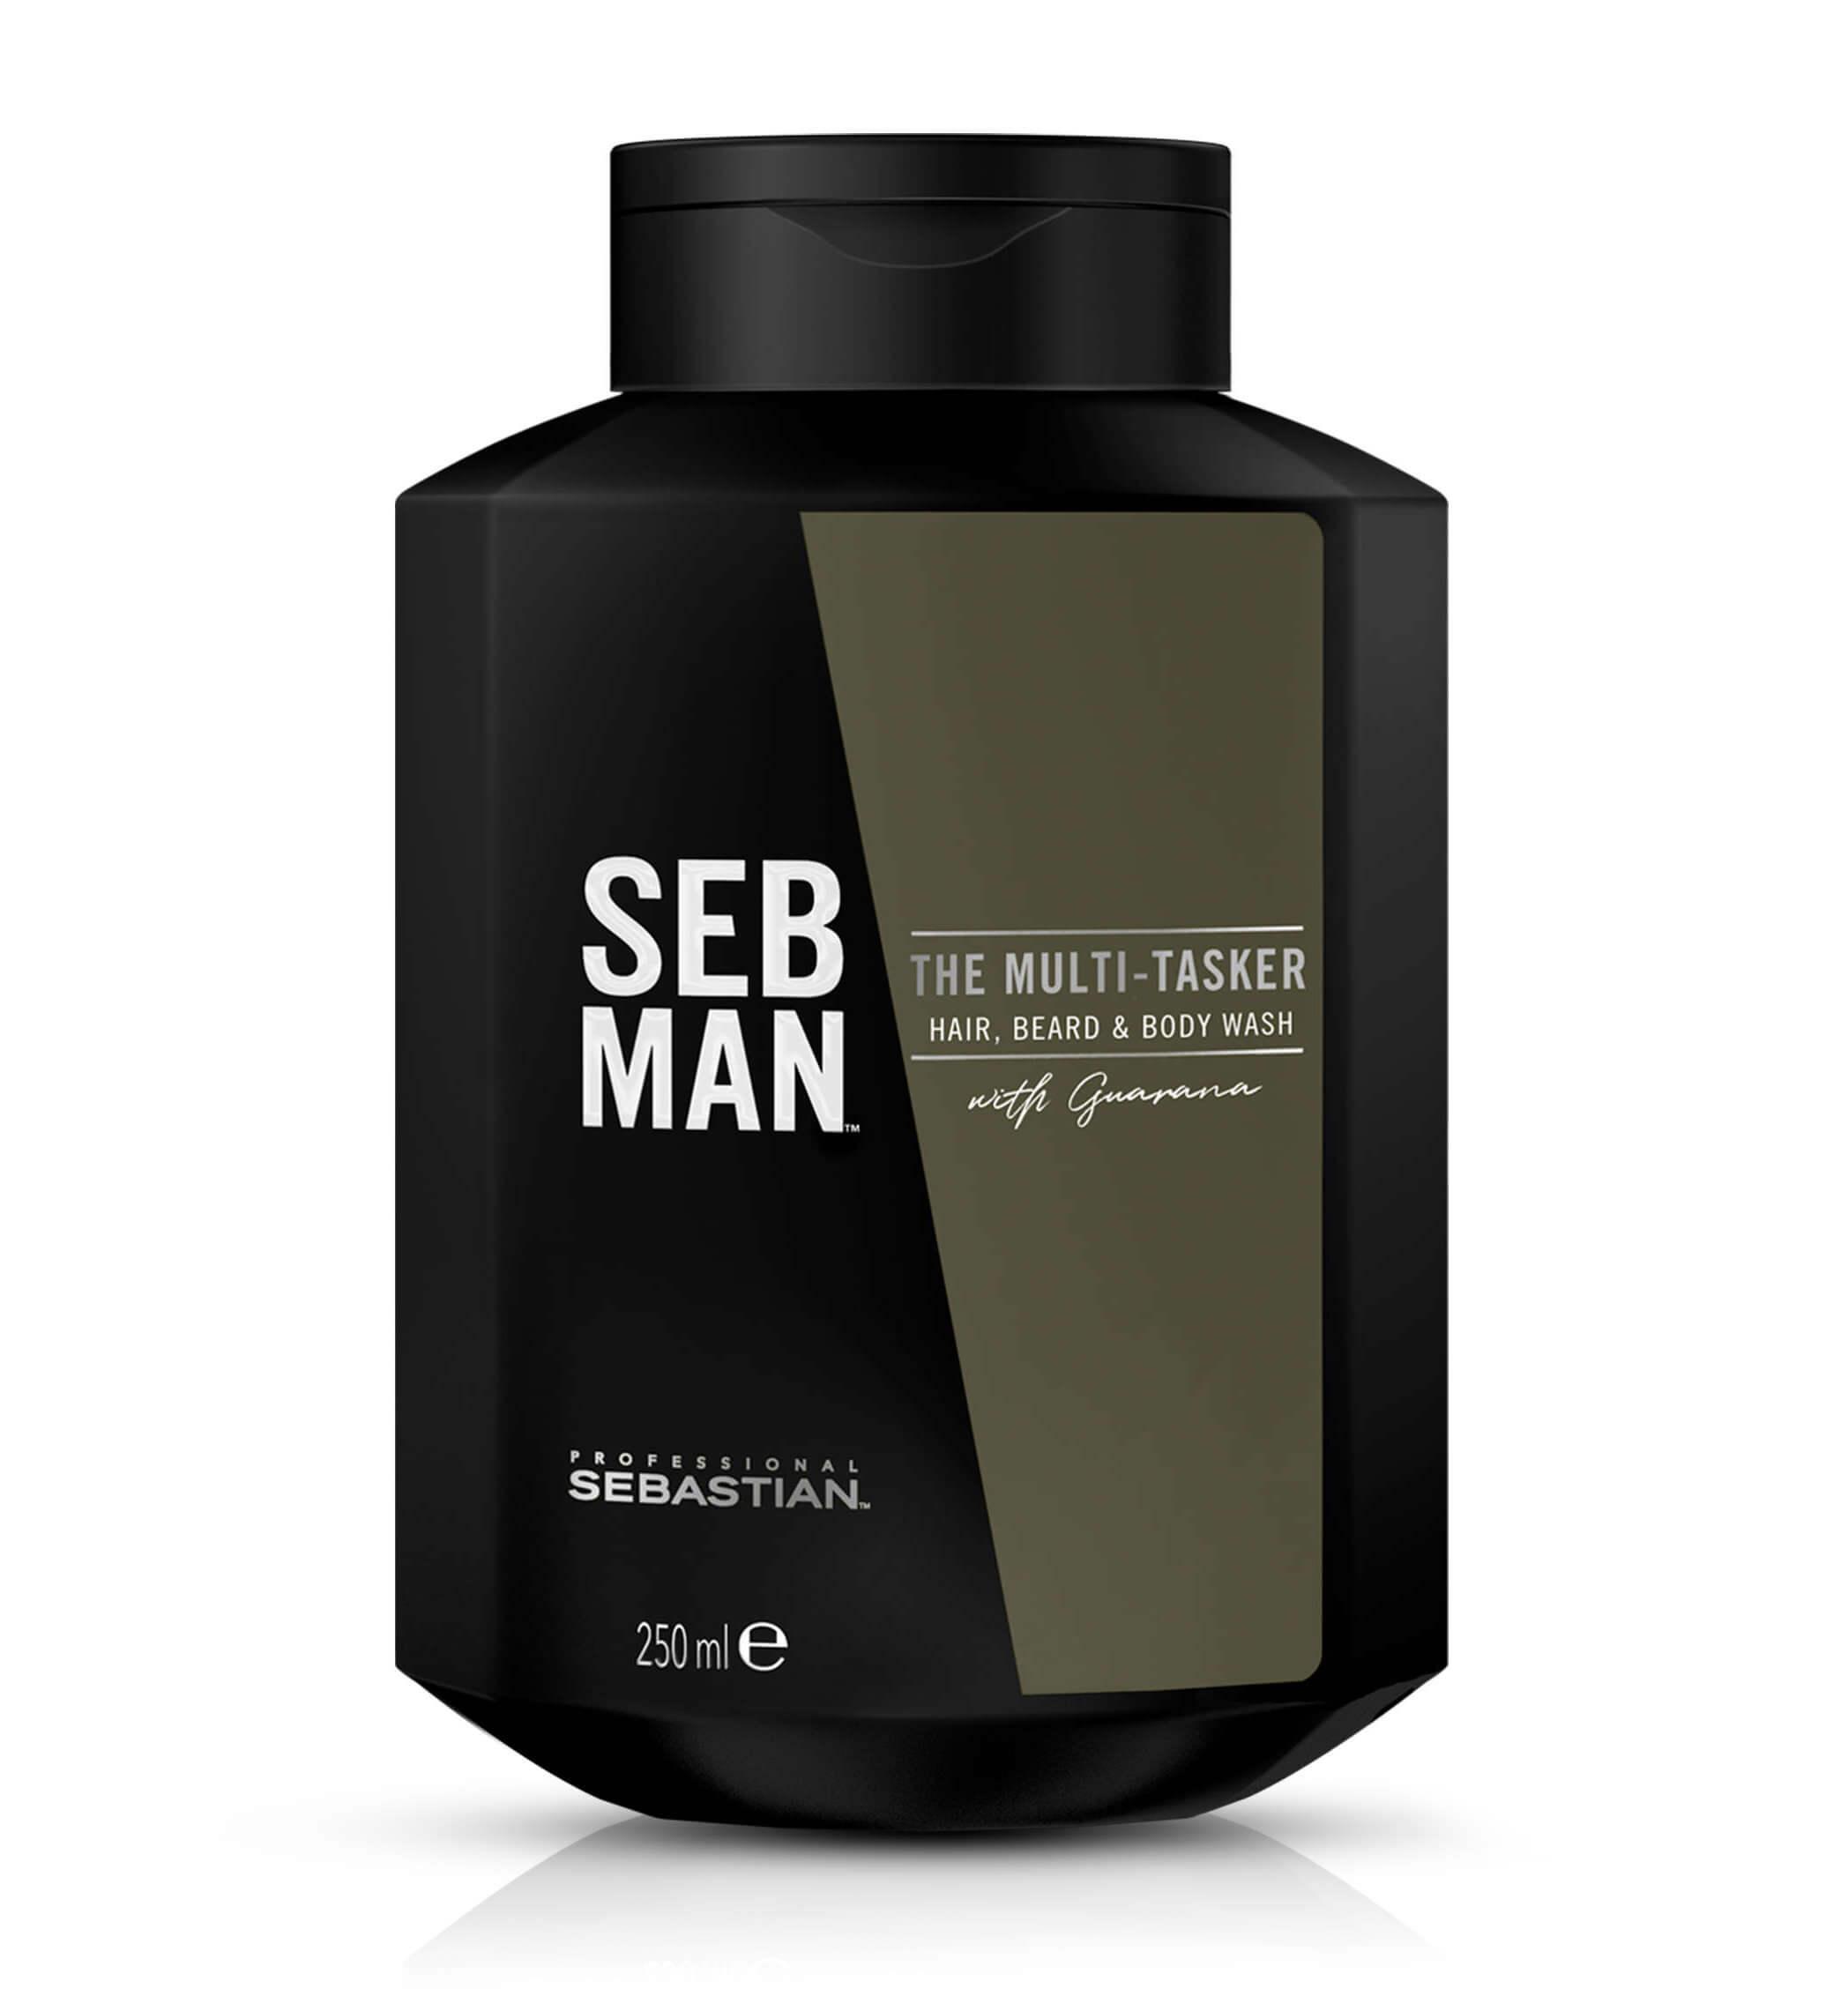 Sebastian Man The Multitasker Shampoo